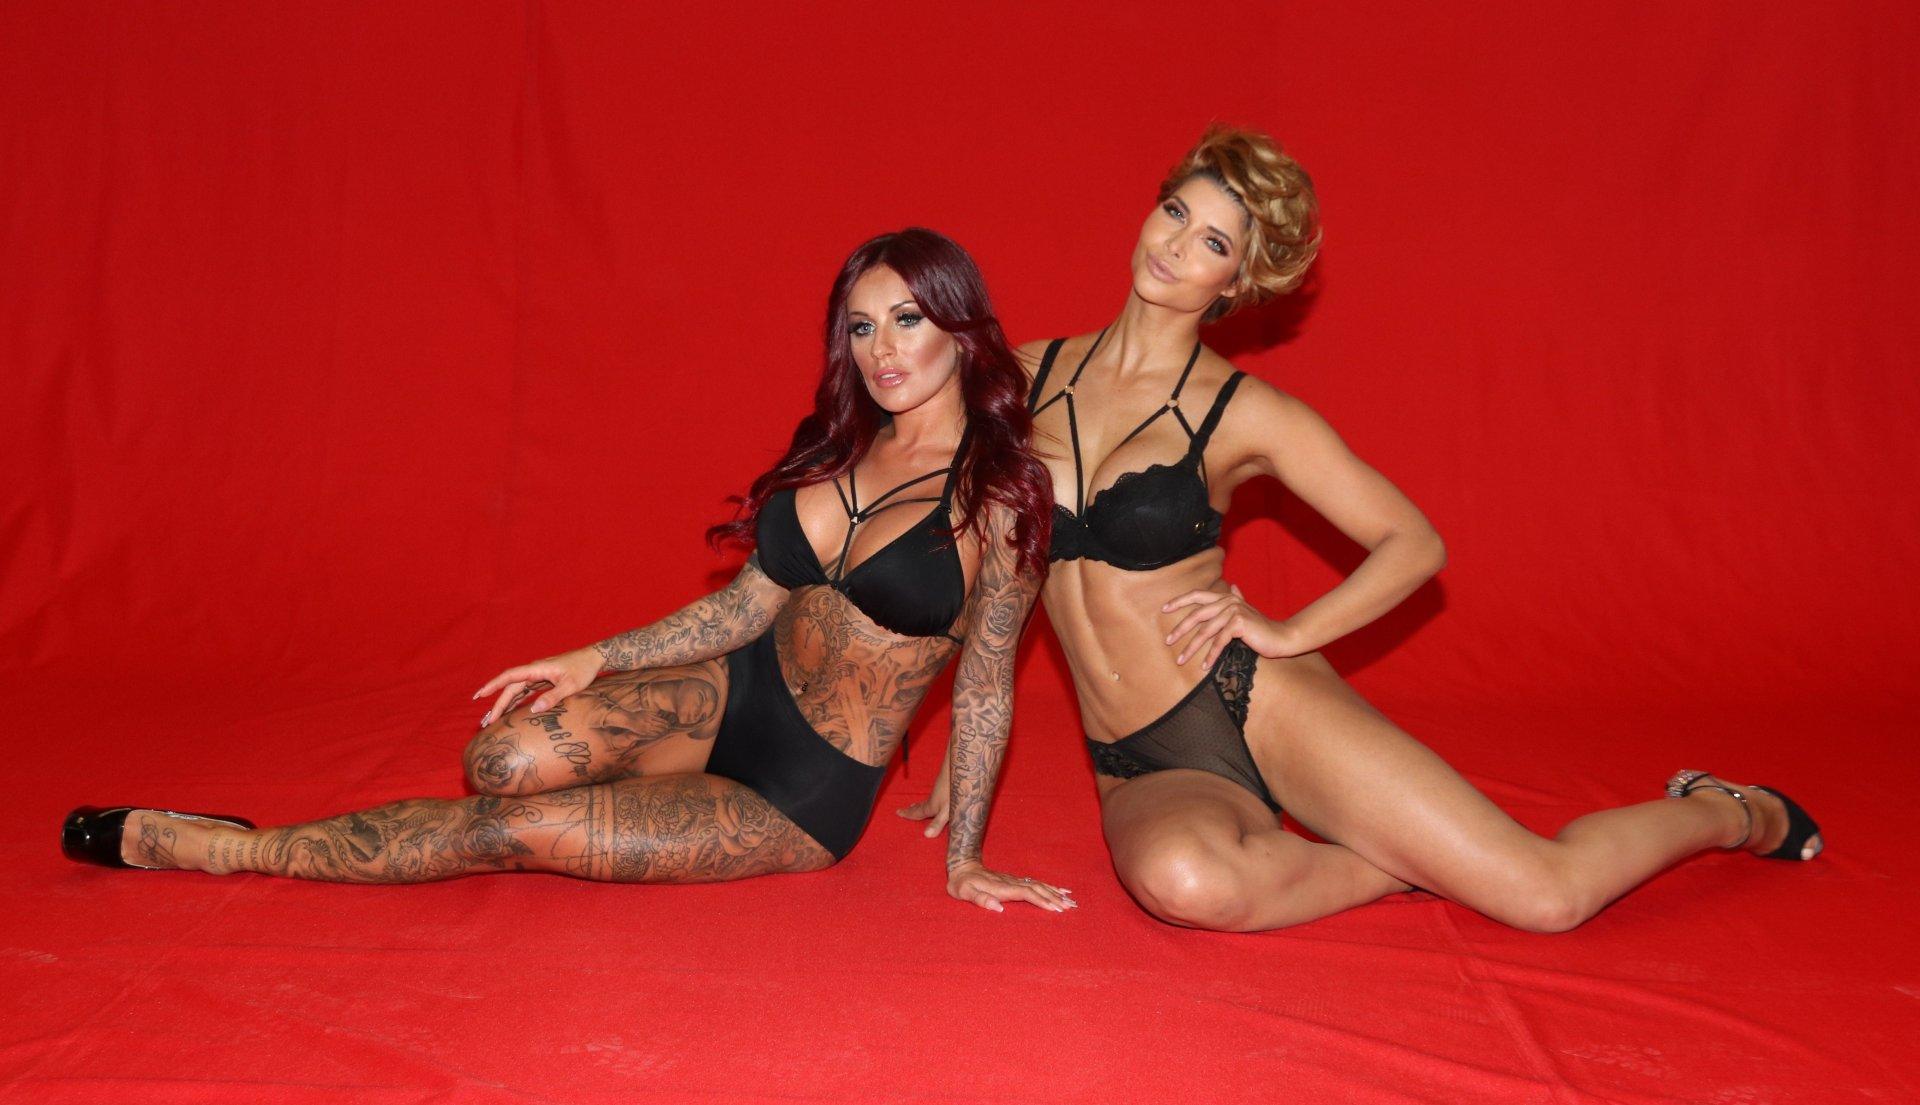 Julia Jasmin Ruehle & Micaela Schaefer Sexy & Topless (36